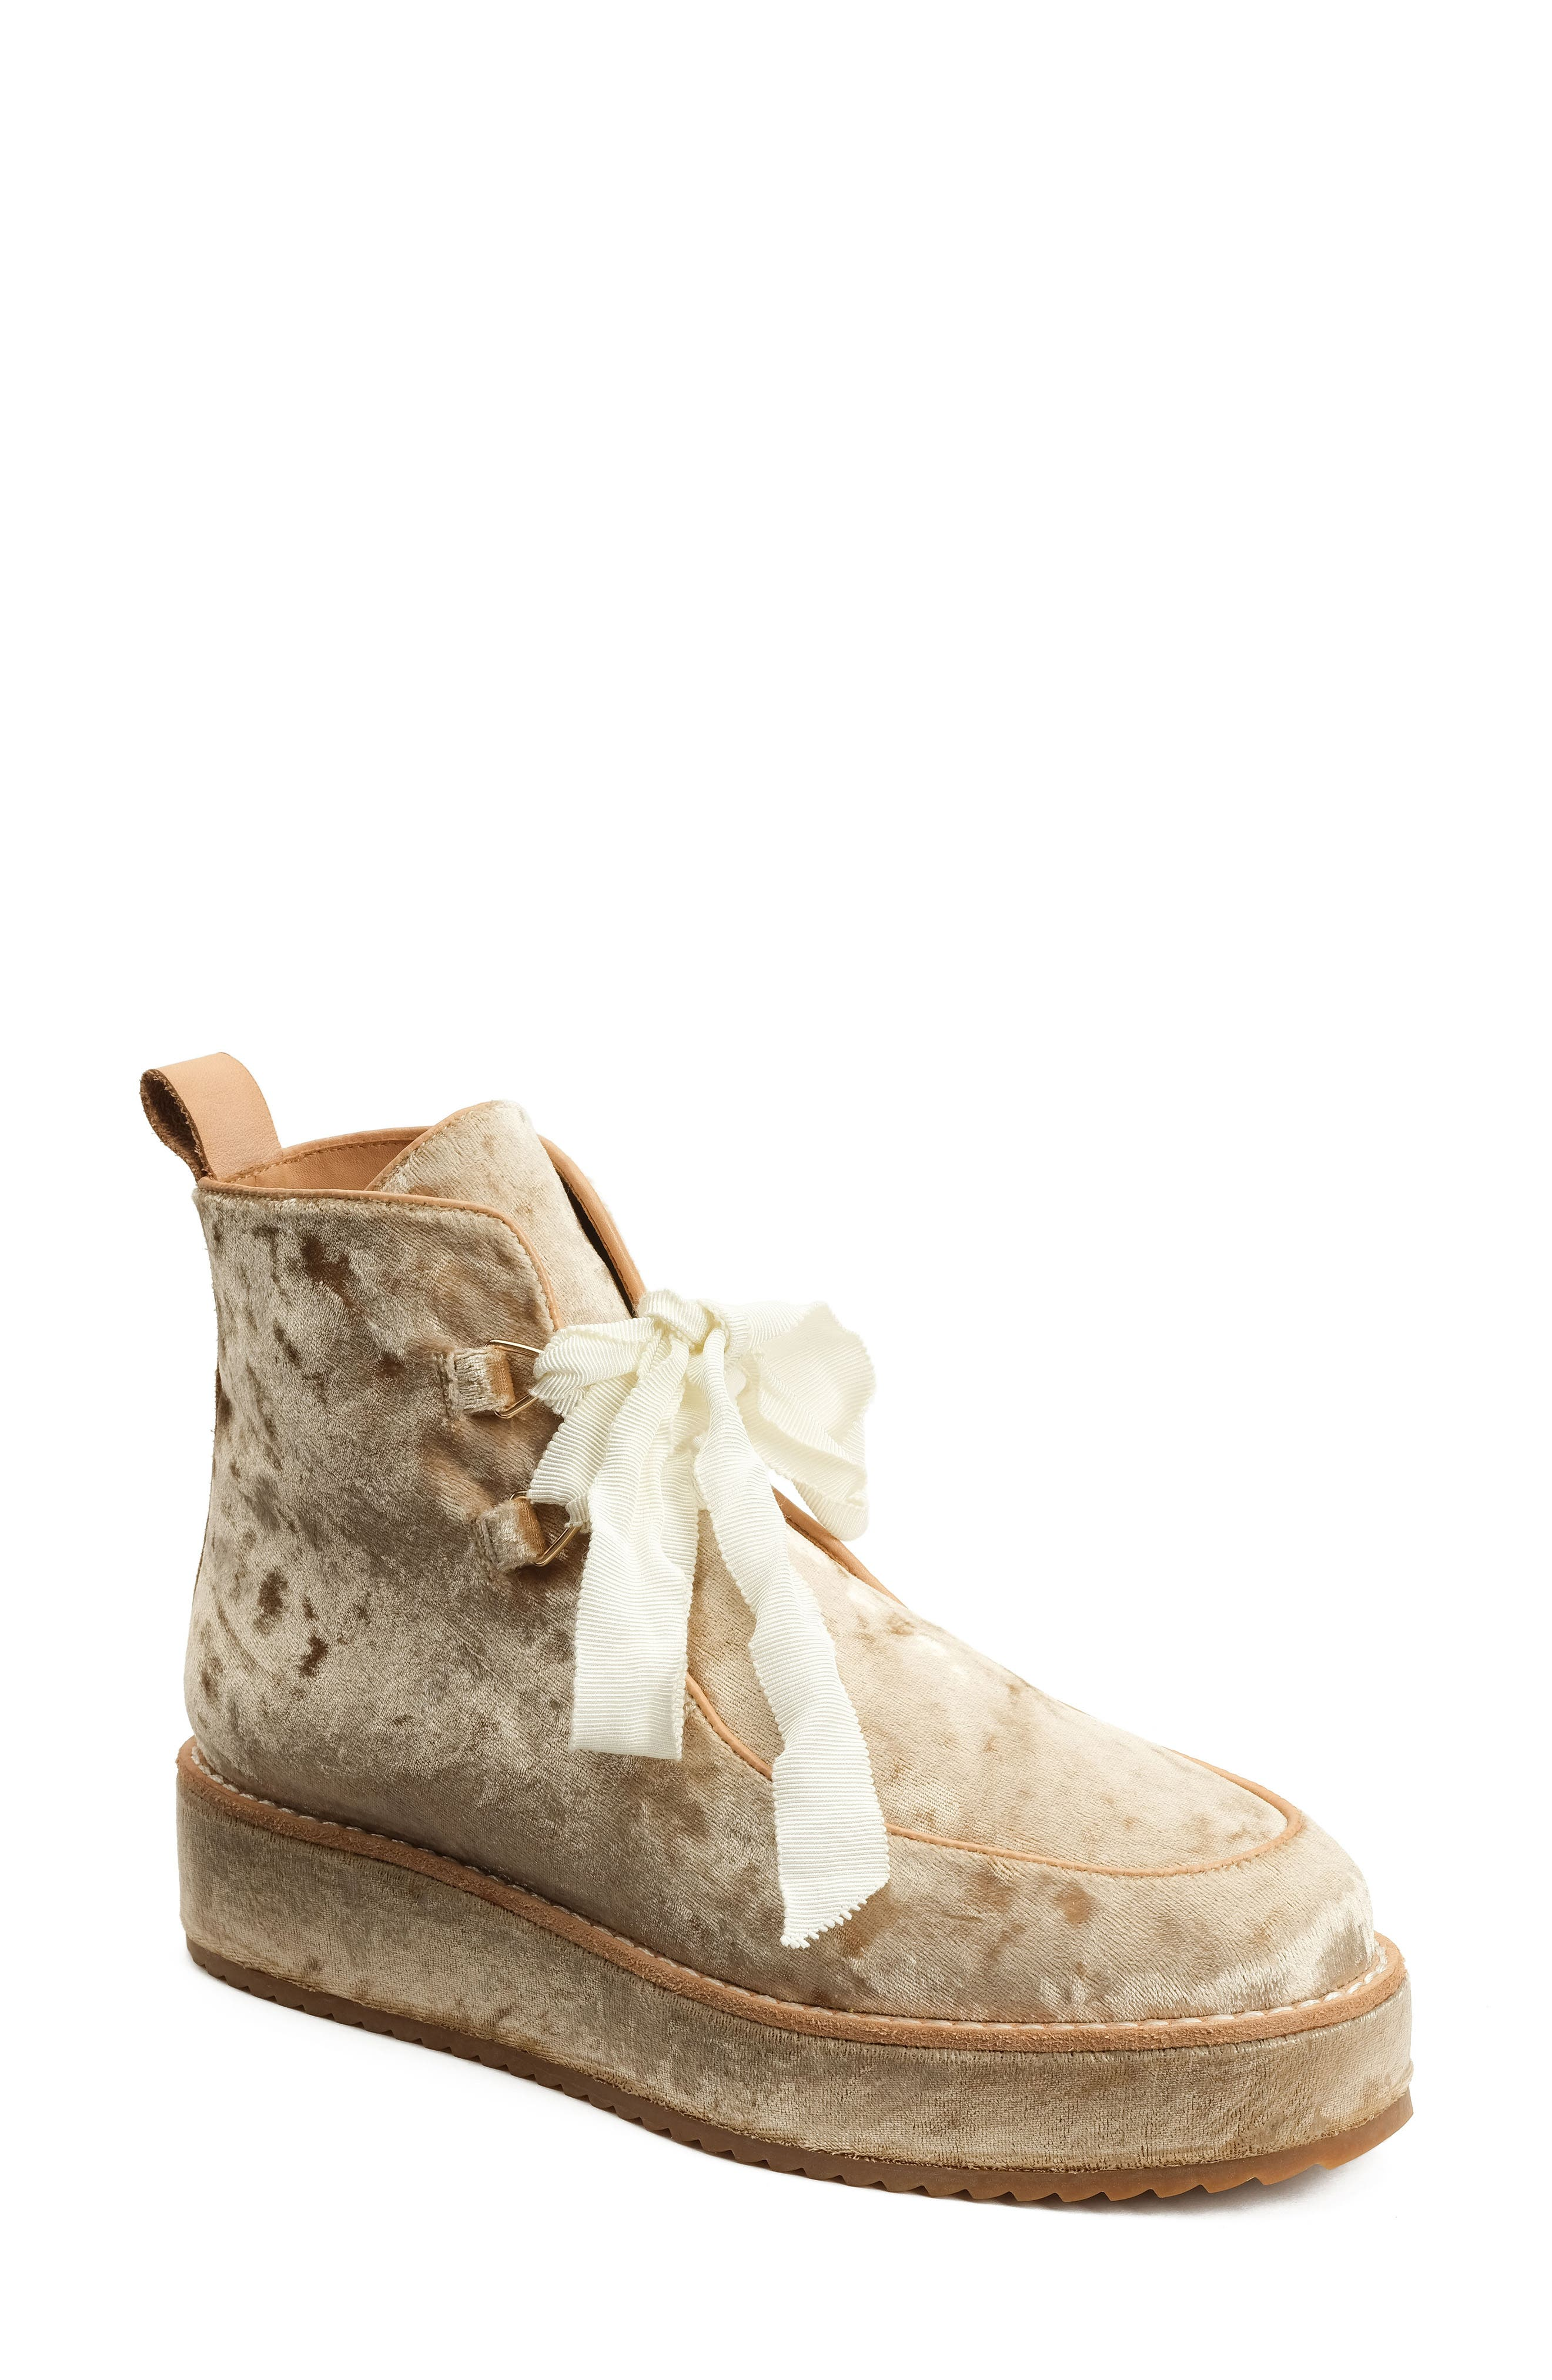 Alternate Image 1 Selected - Bill Blass Penny Sutton Chukka Boot (Women)